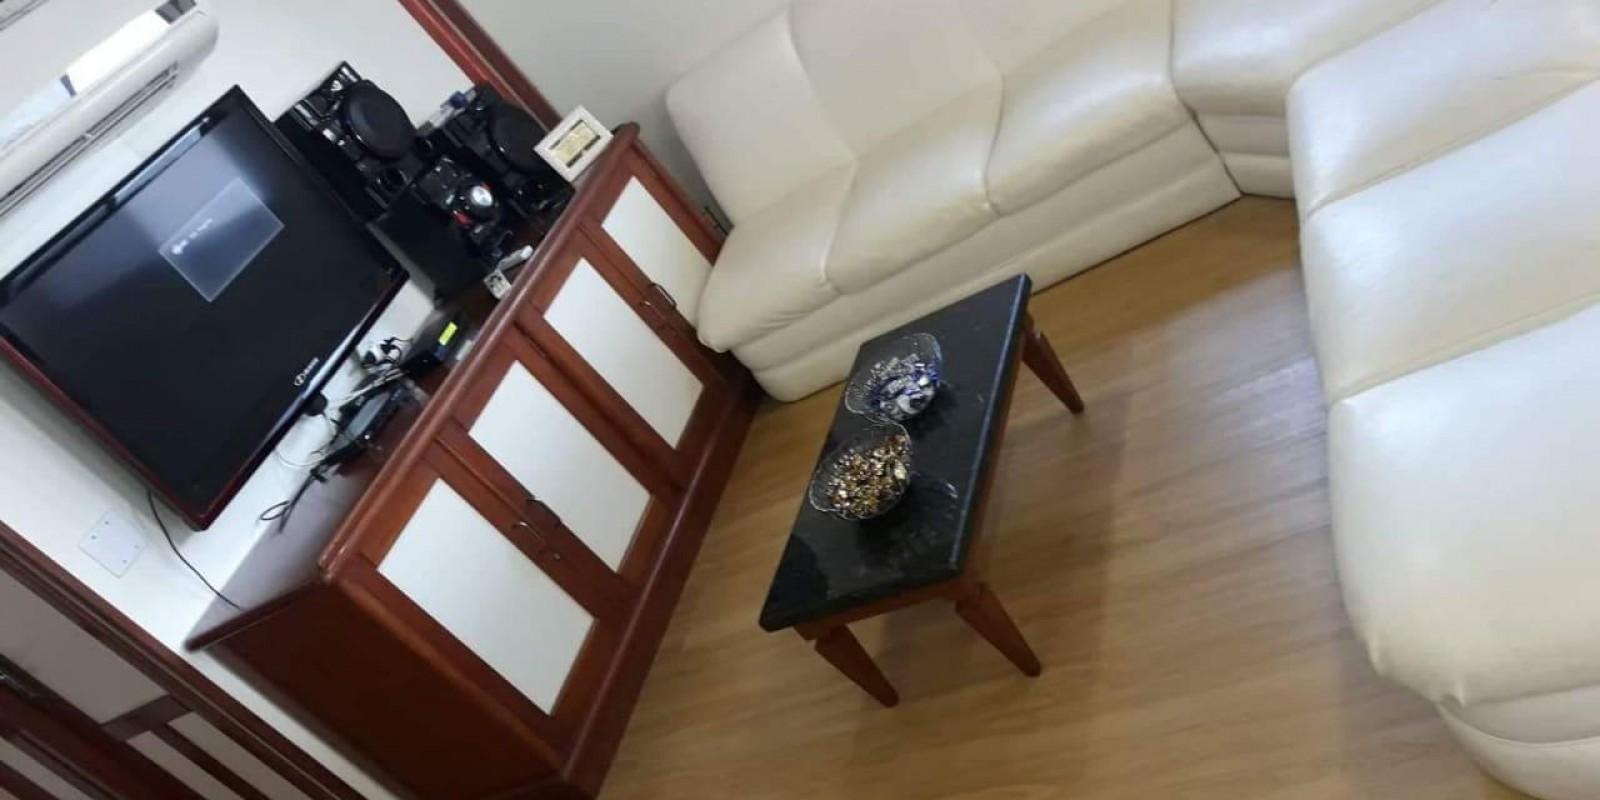 BARCO HOTEL ANTARES / CORUMBA - Foto 8 de 17